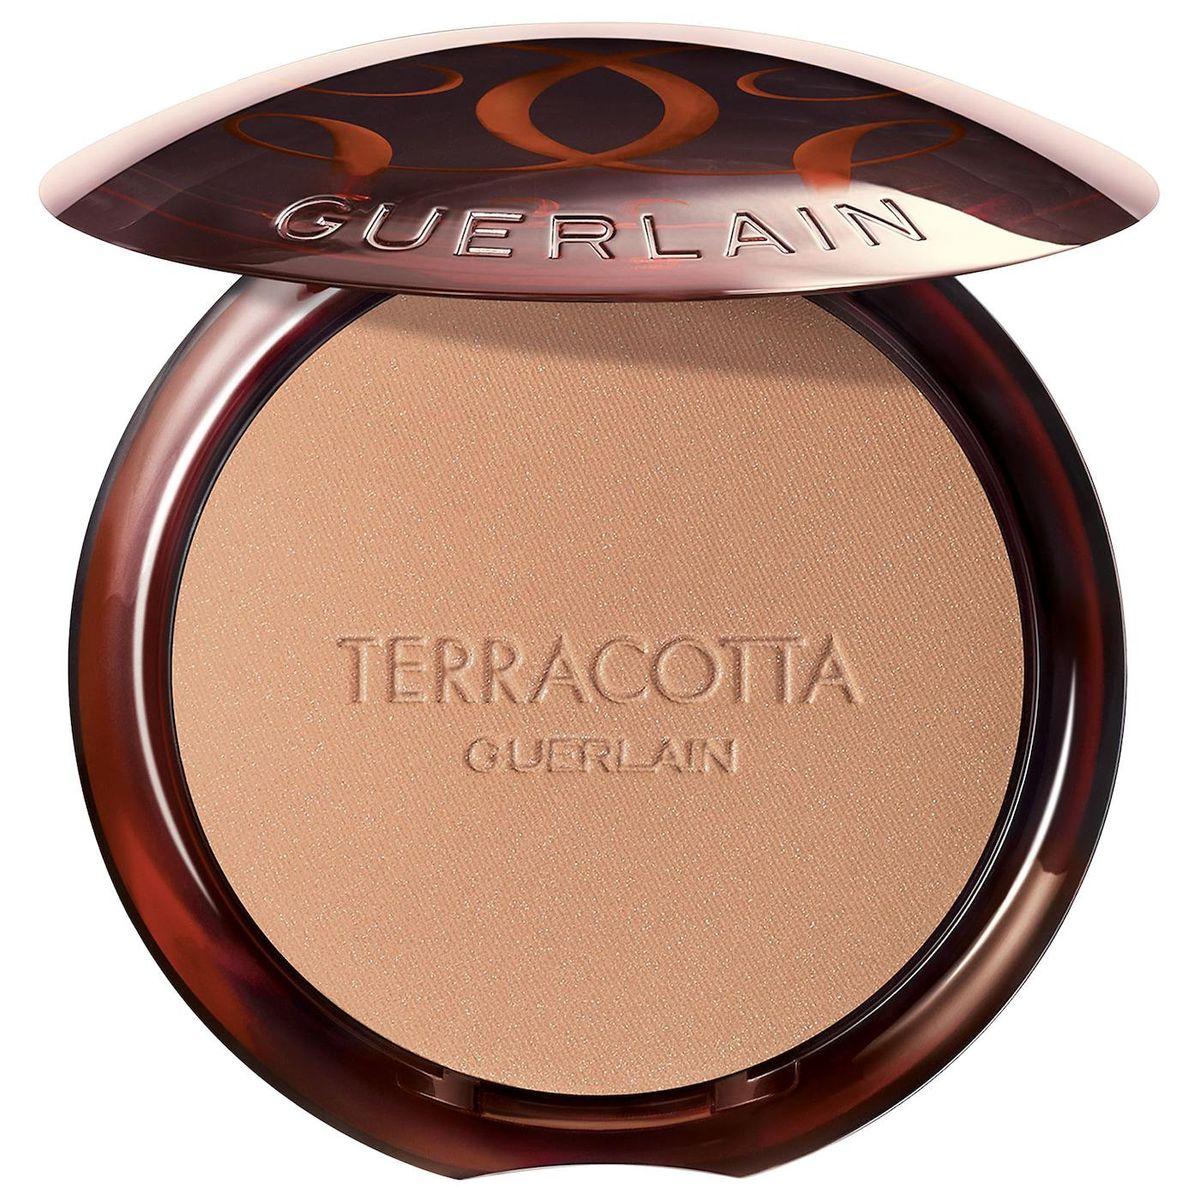 guerlain terracotta sunkissed natural finish bronzing powder